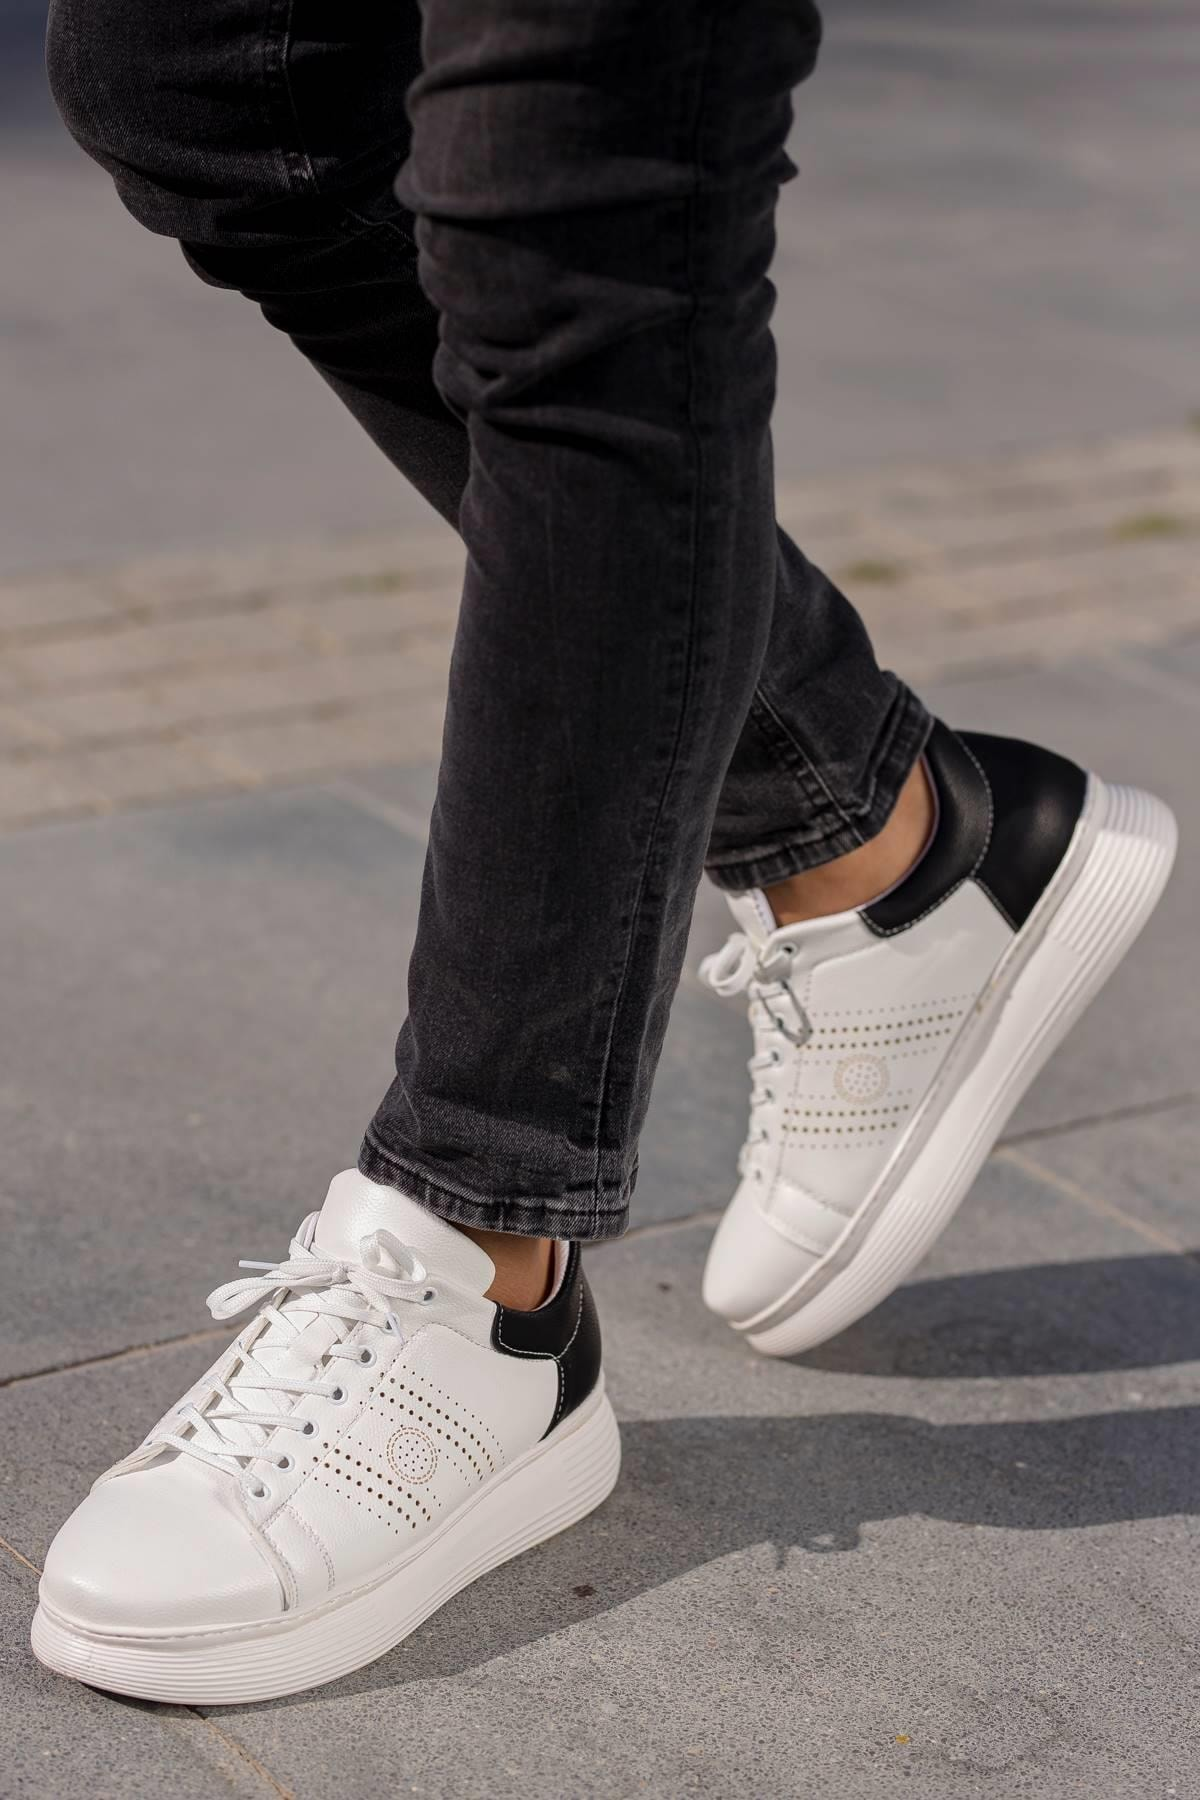 MUGGO MGALERON04 Erkek Sneaker Ayakkabı 2